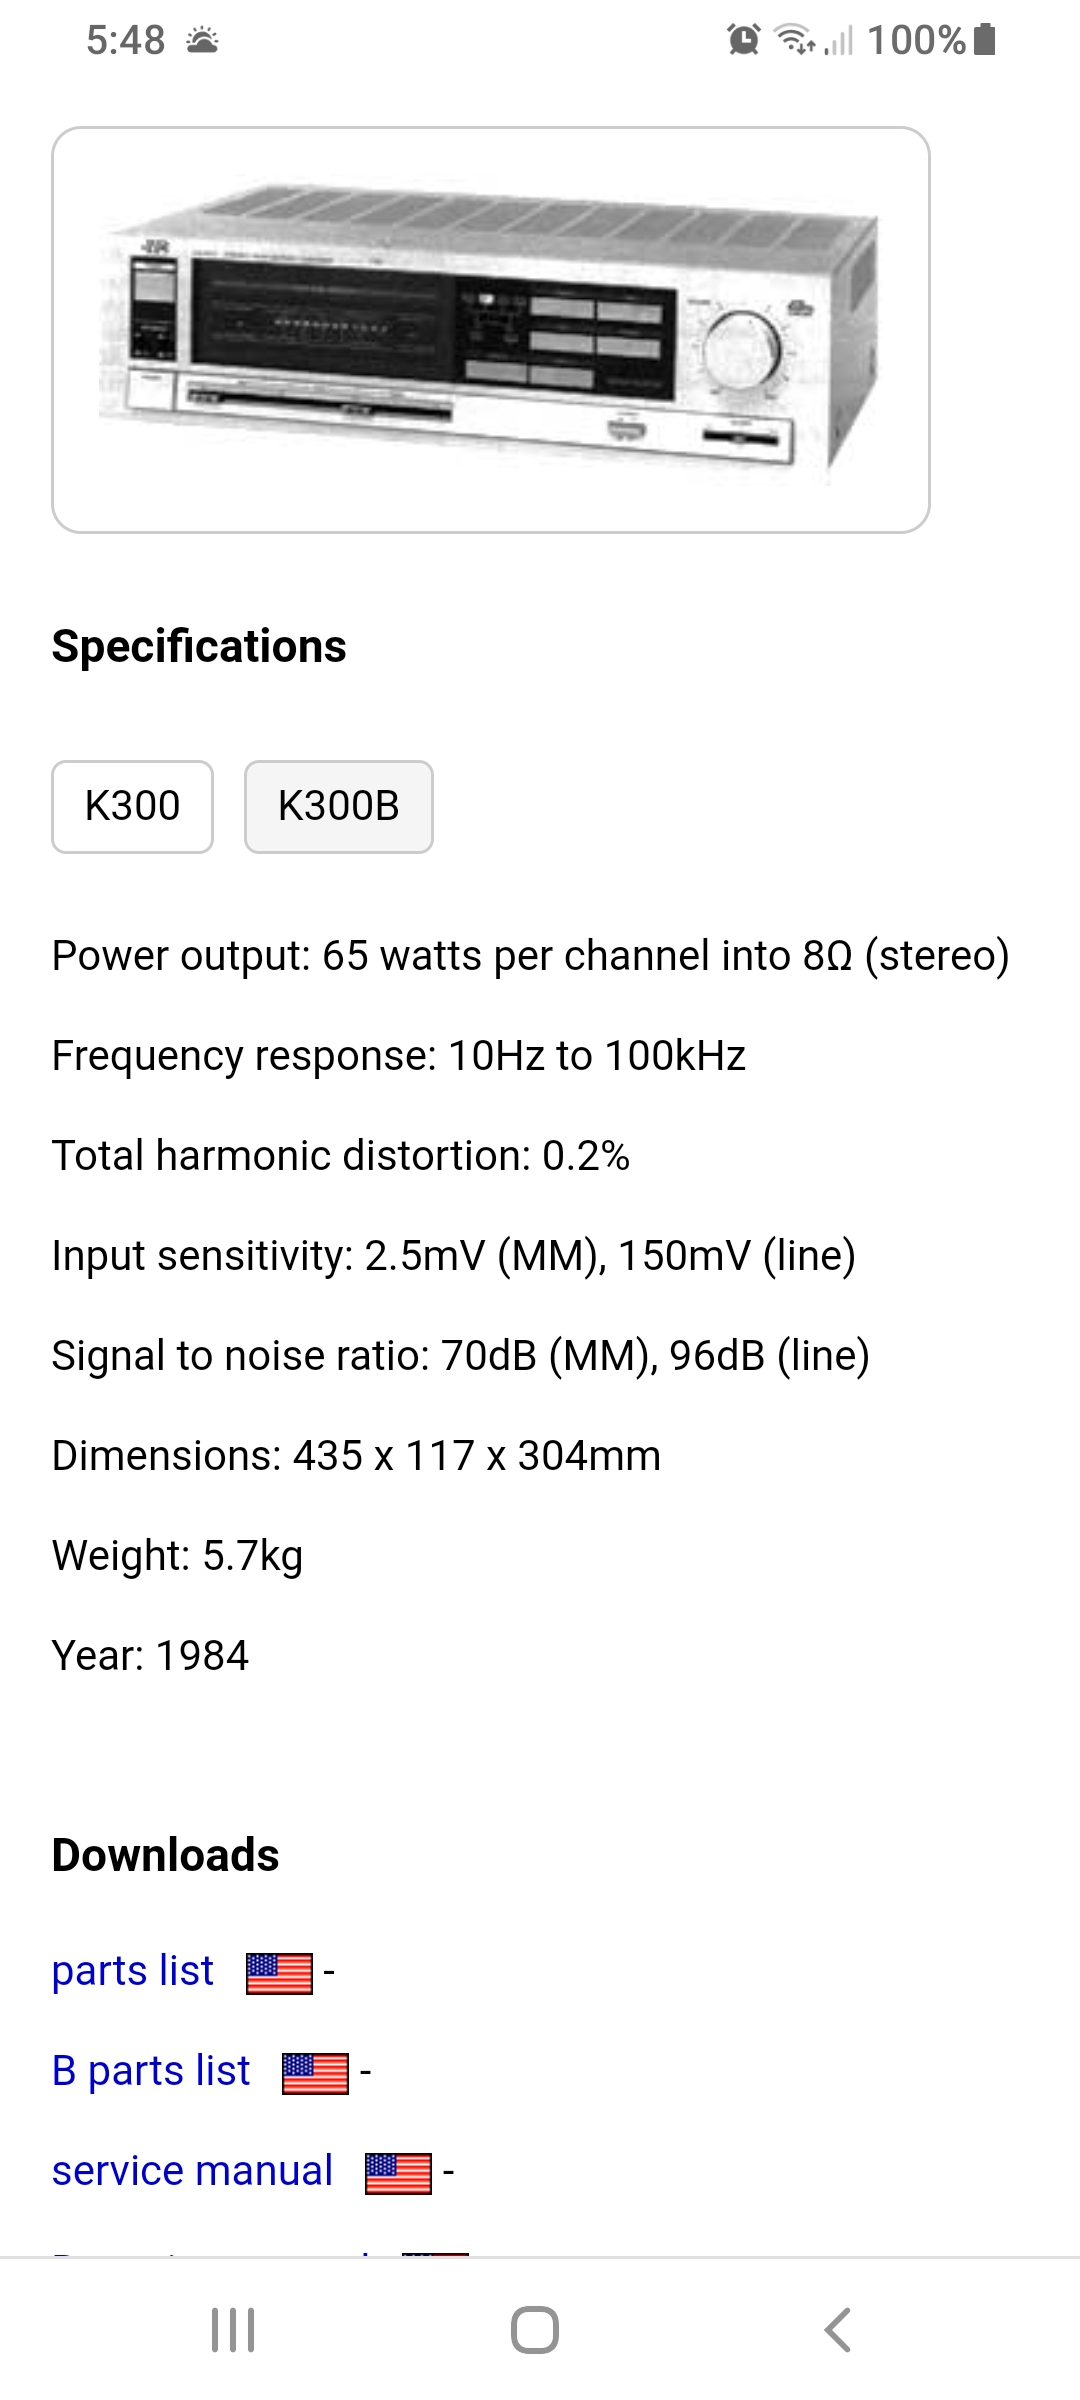 Sobre JVC, jvc a-k300, que tal es ? de que año ? Alguien con mas info ? Screenshot-20200130-054817-Chrome